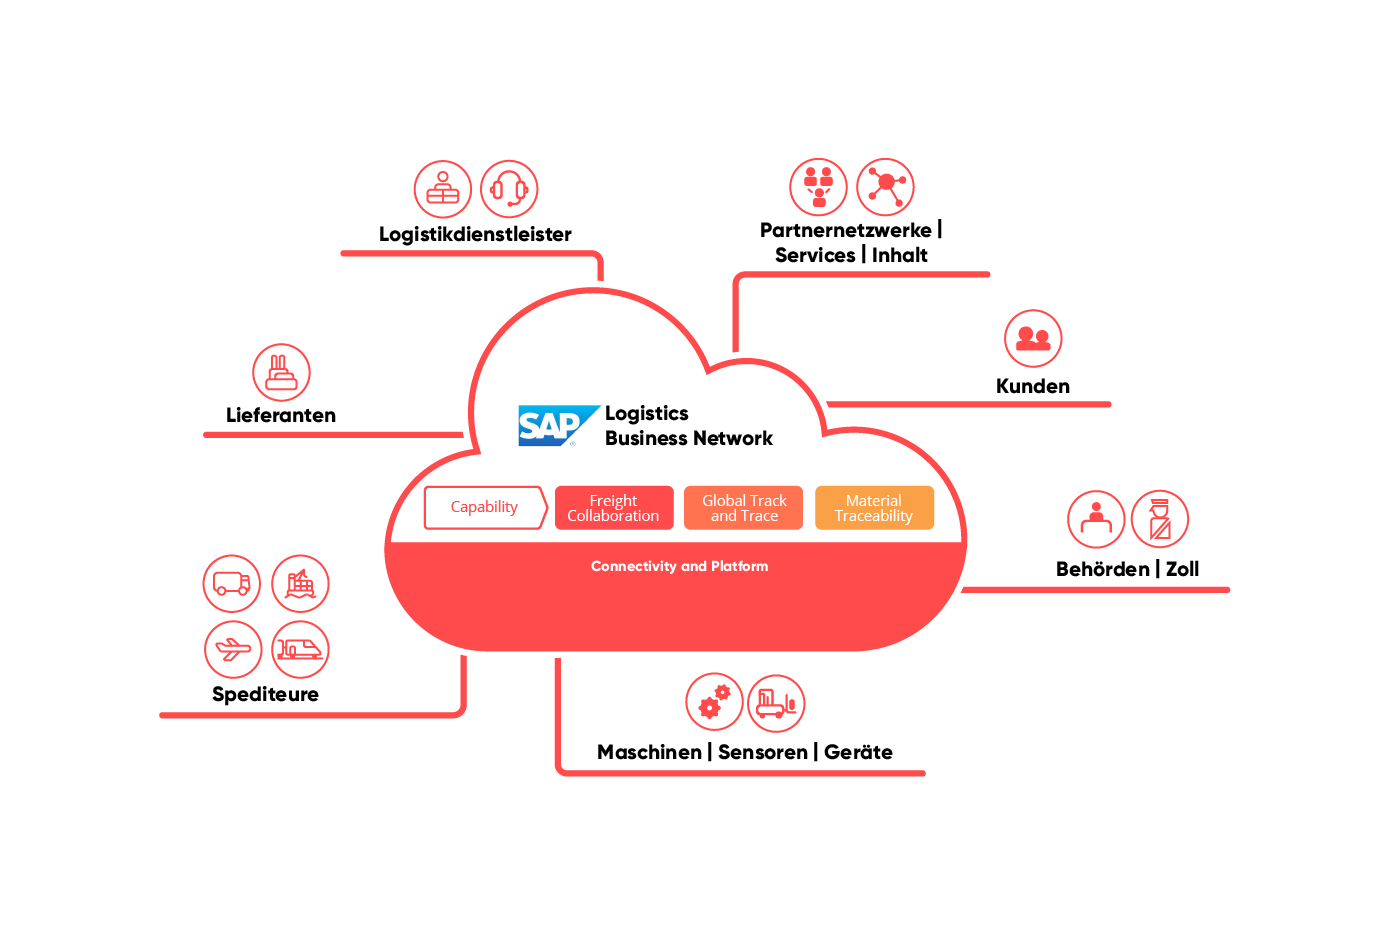 valantic Grafik zum Thema SAP Logistics Business Network